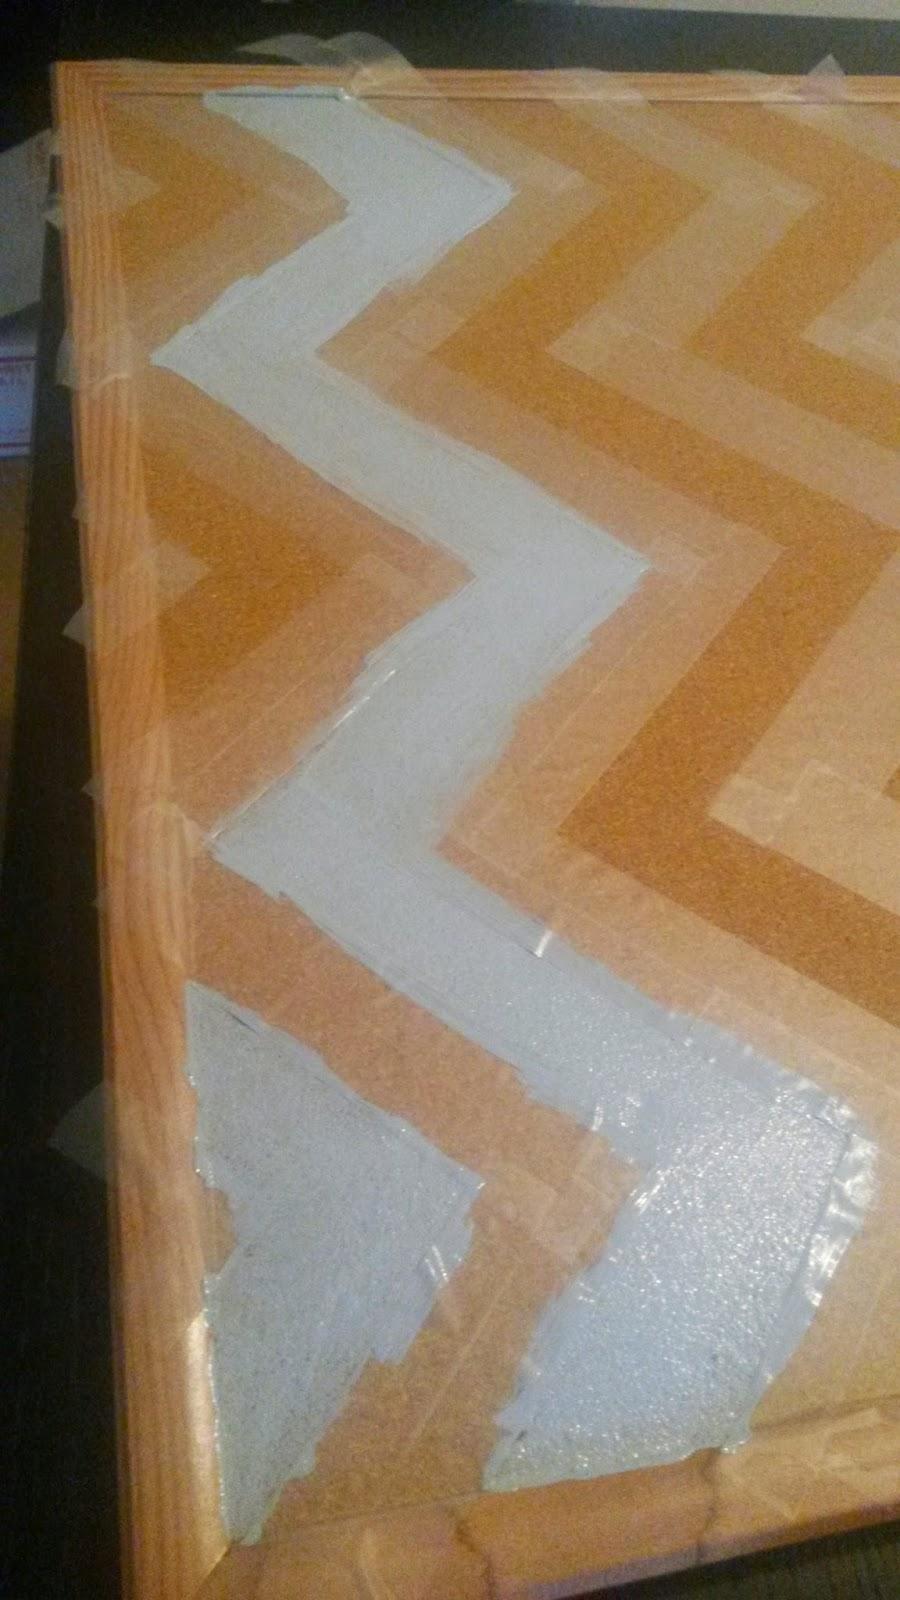 In Progress Chevron Painted Cork Board from The Delightful